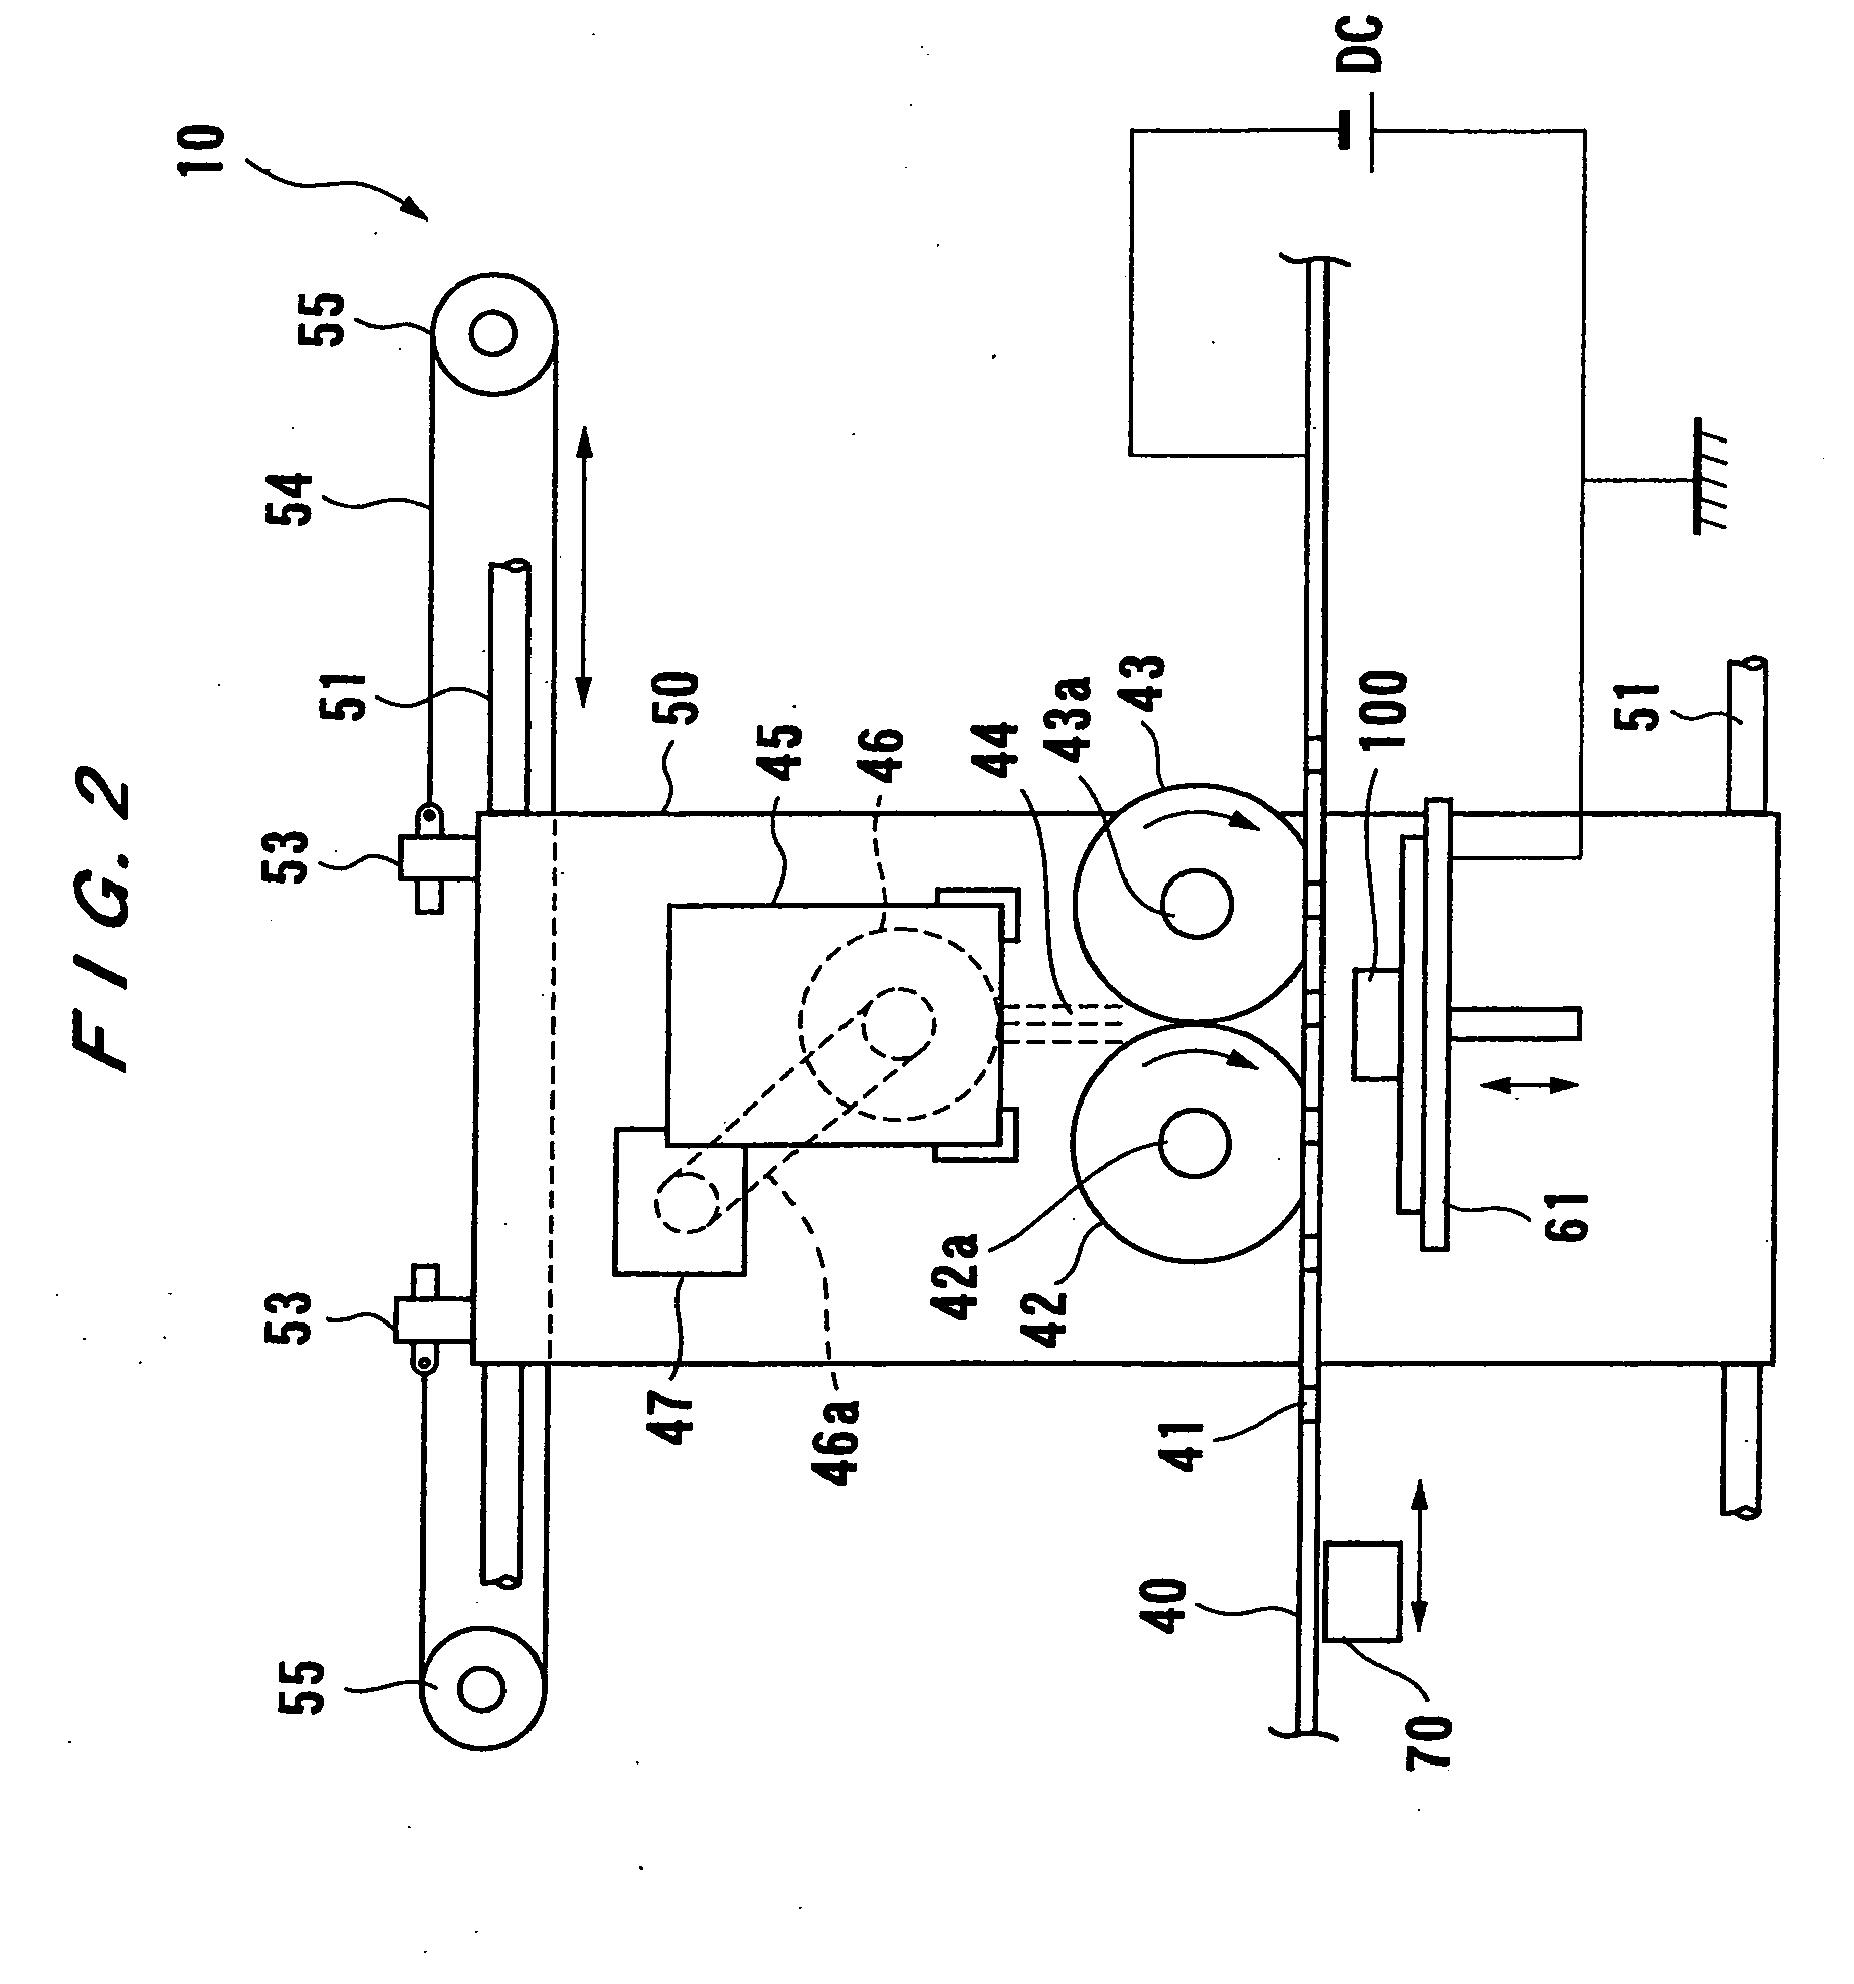 专利ep2165831a2 - electrostatic